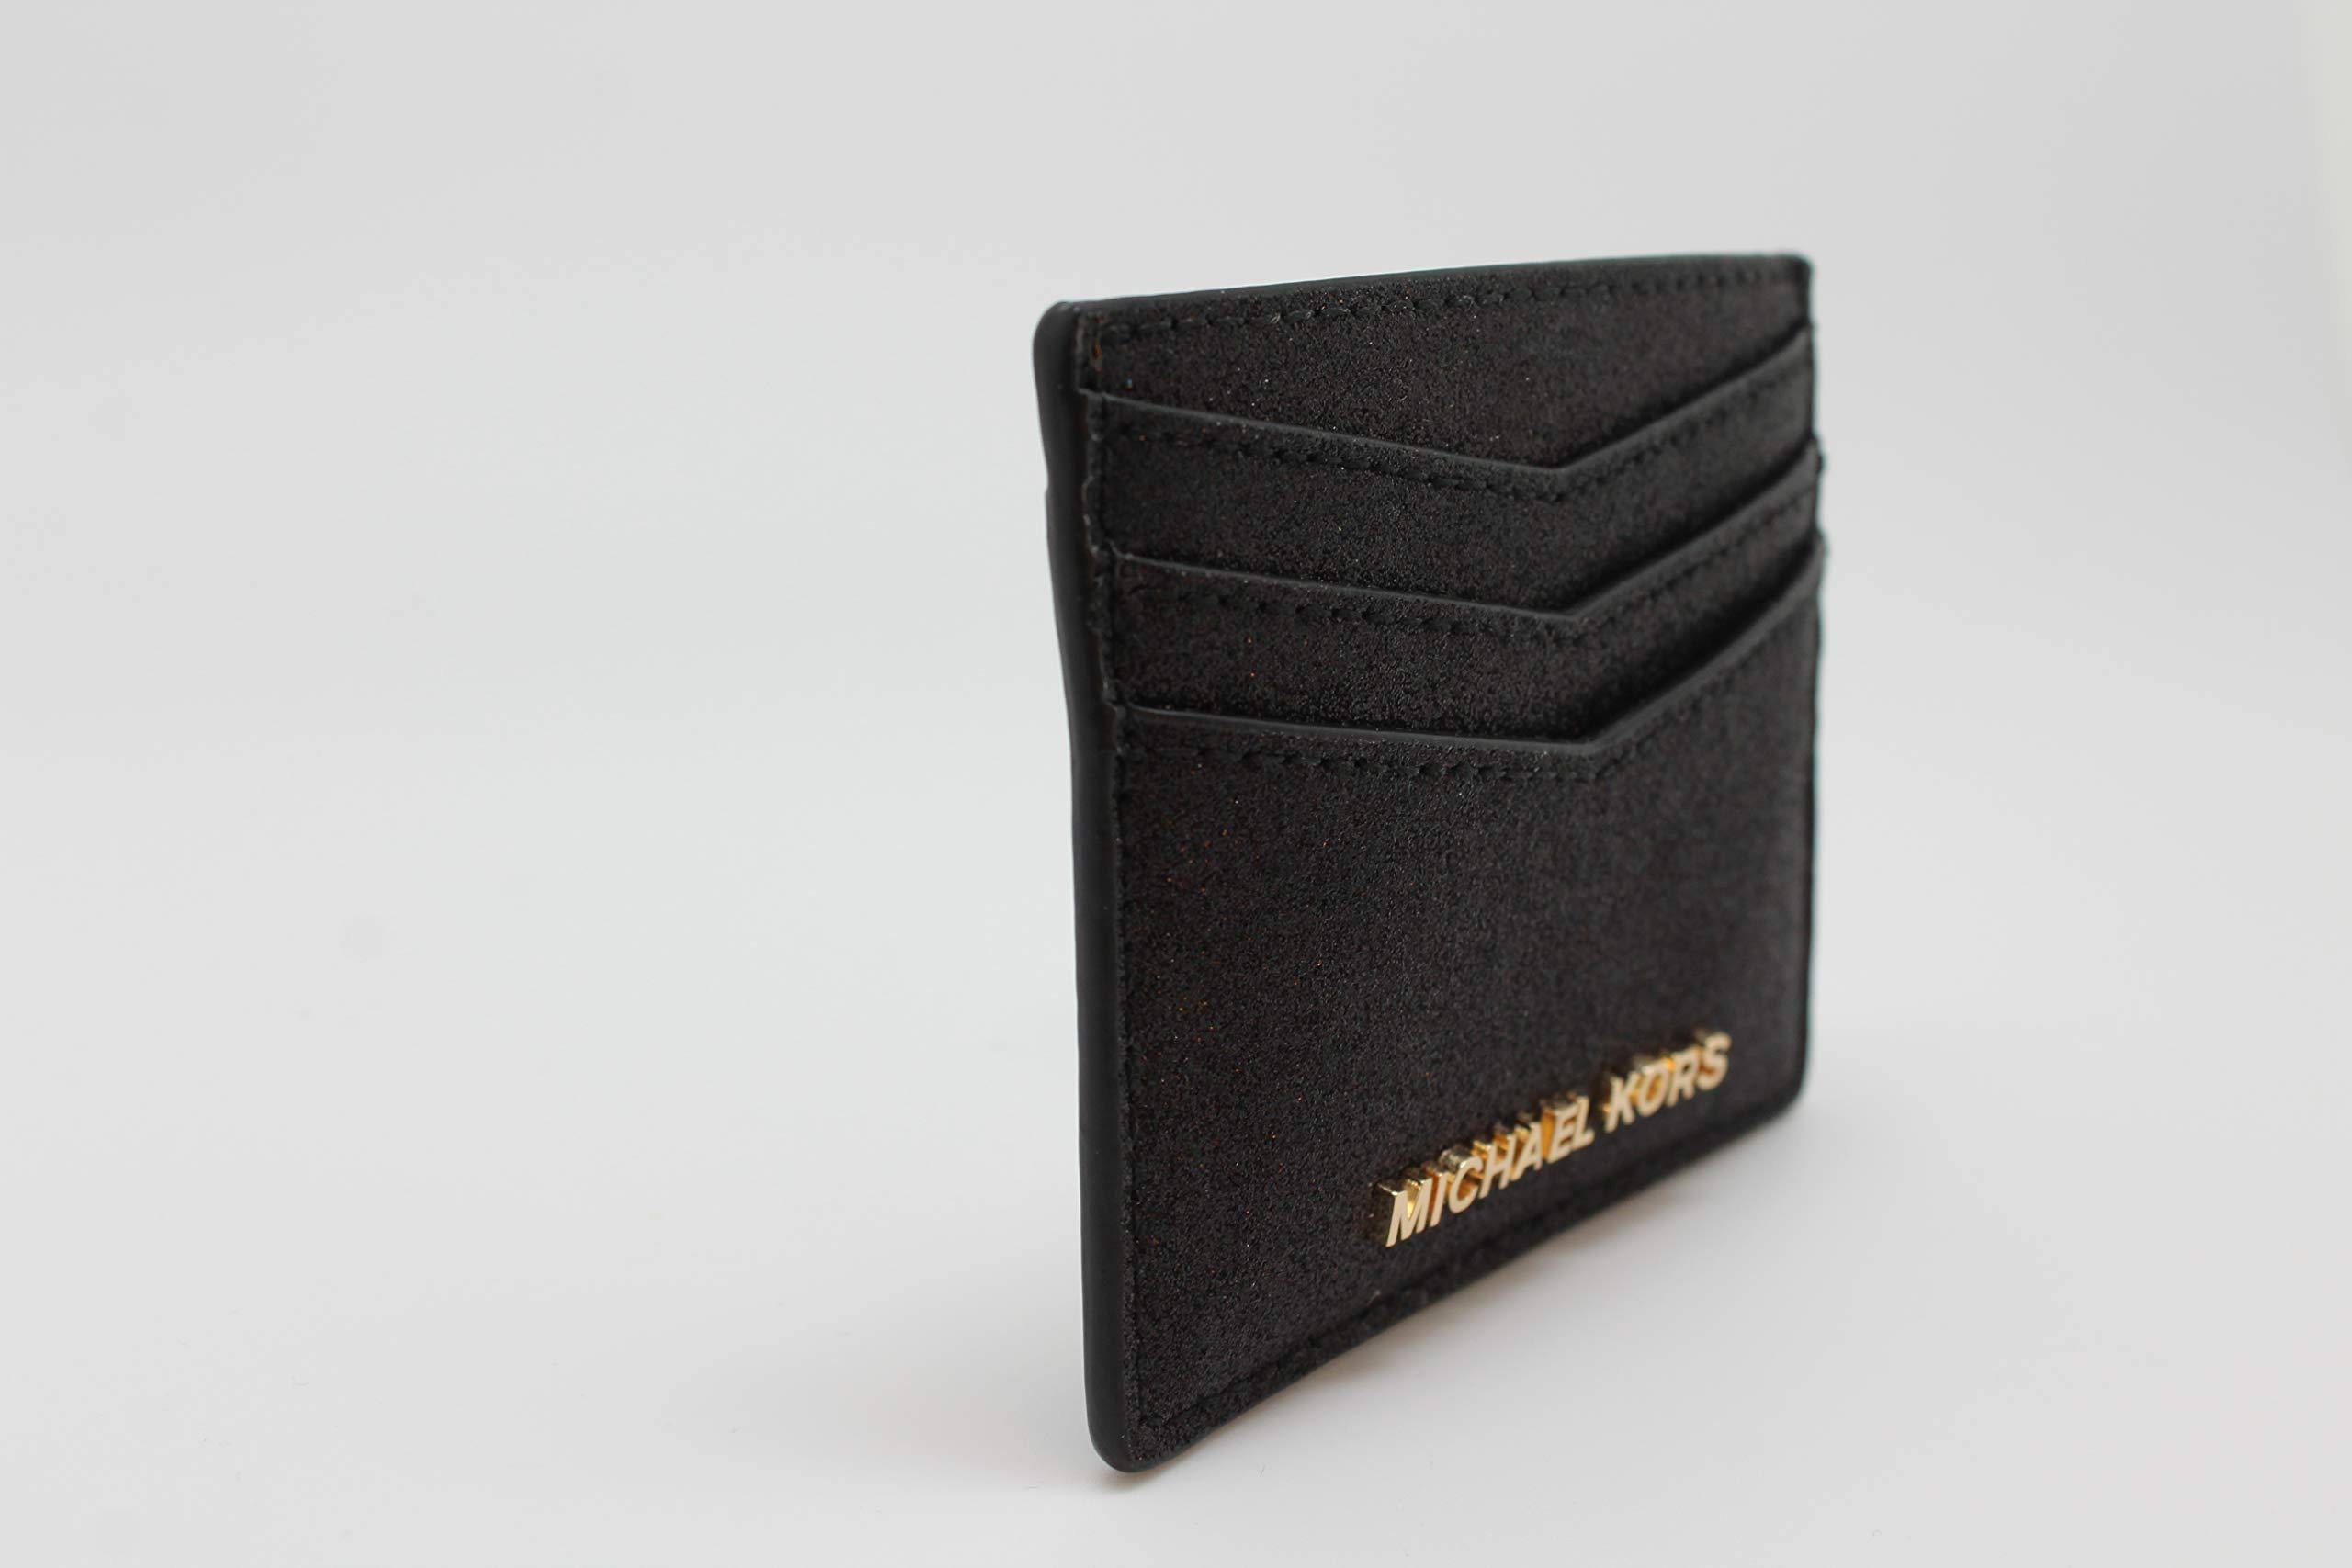 Michael Kors Giftables Large Card Holder Black Glitter by Michael Kors (Image #6)